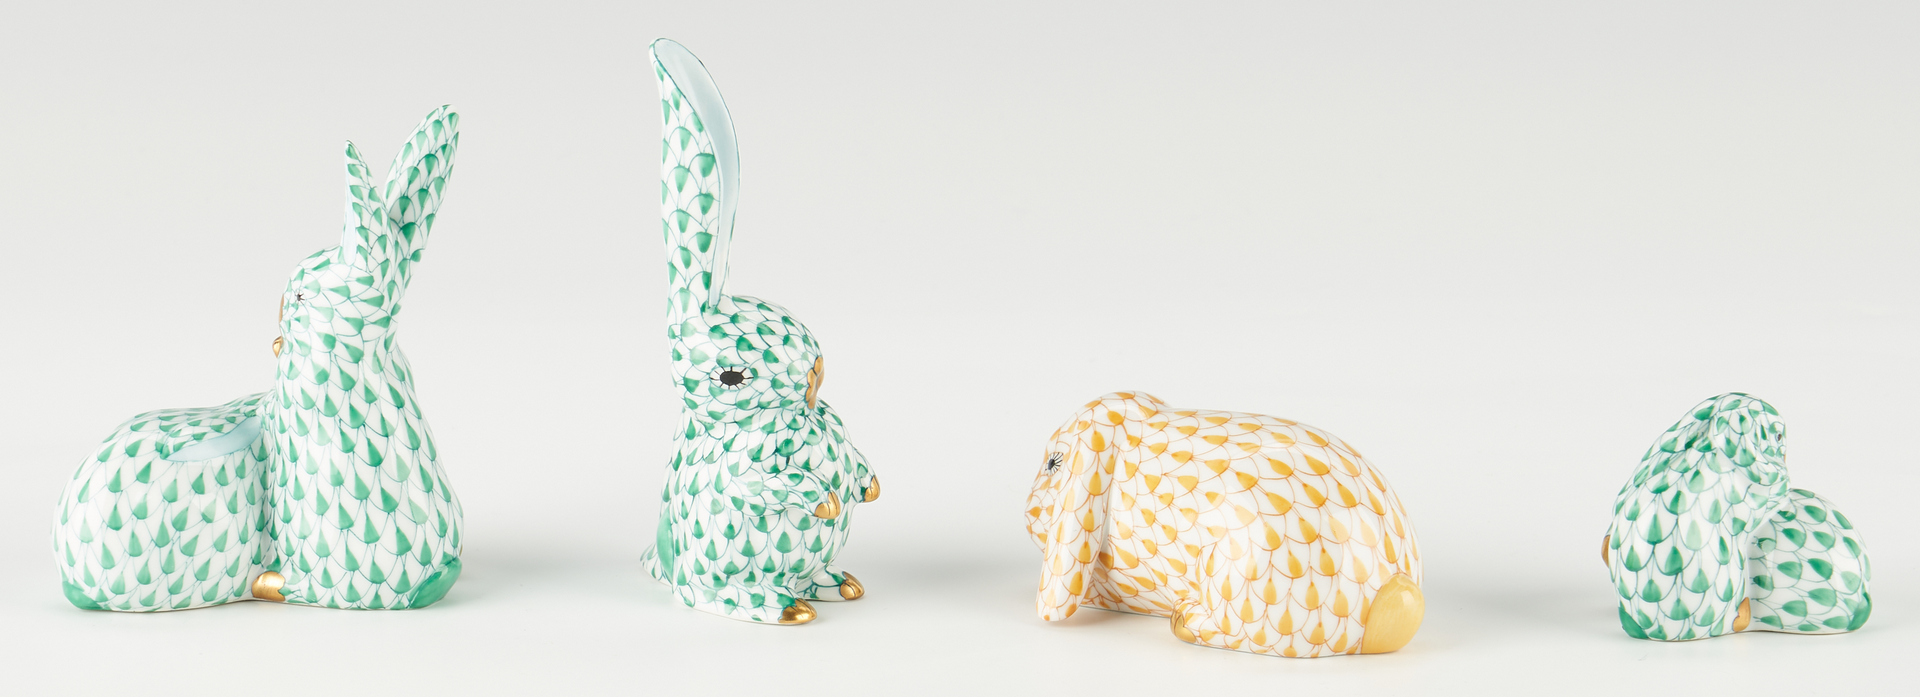 Lot 334: 7 Herend Rabbit Porcelain Figurines